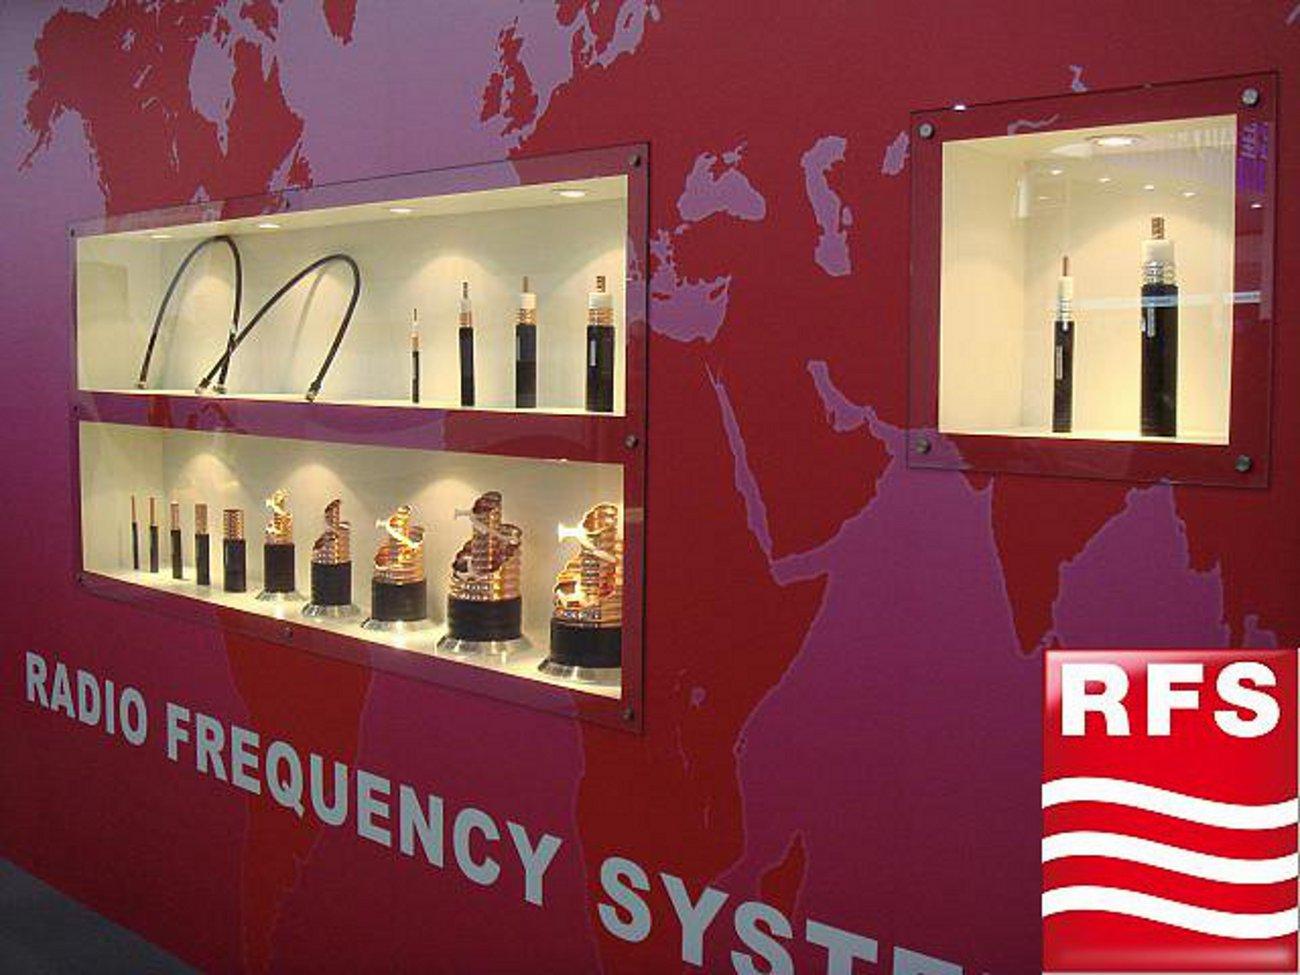 RFS: RFS @ China Content Broadcasting Network 2013